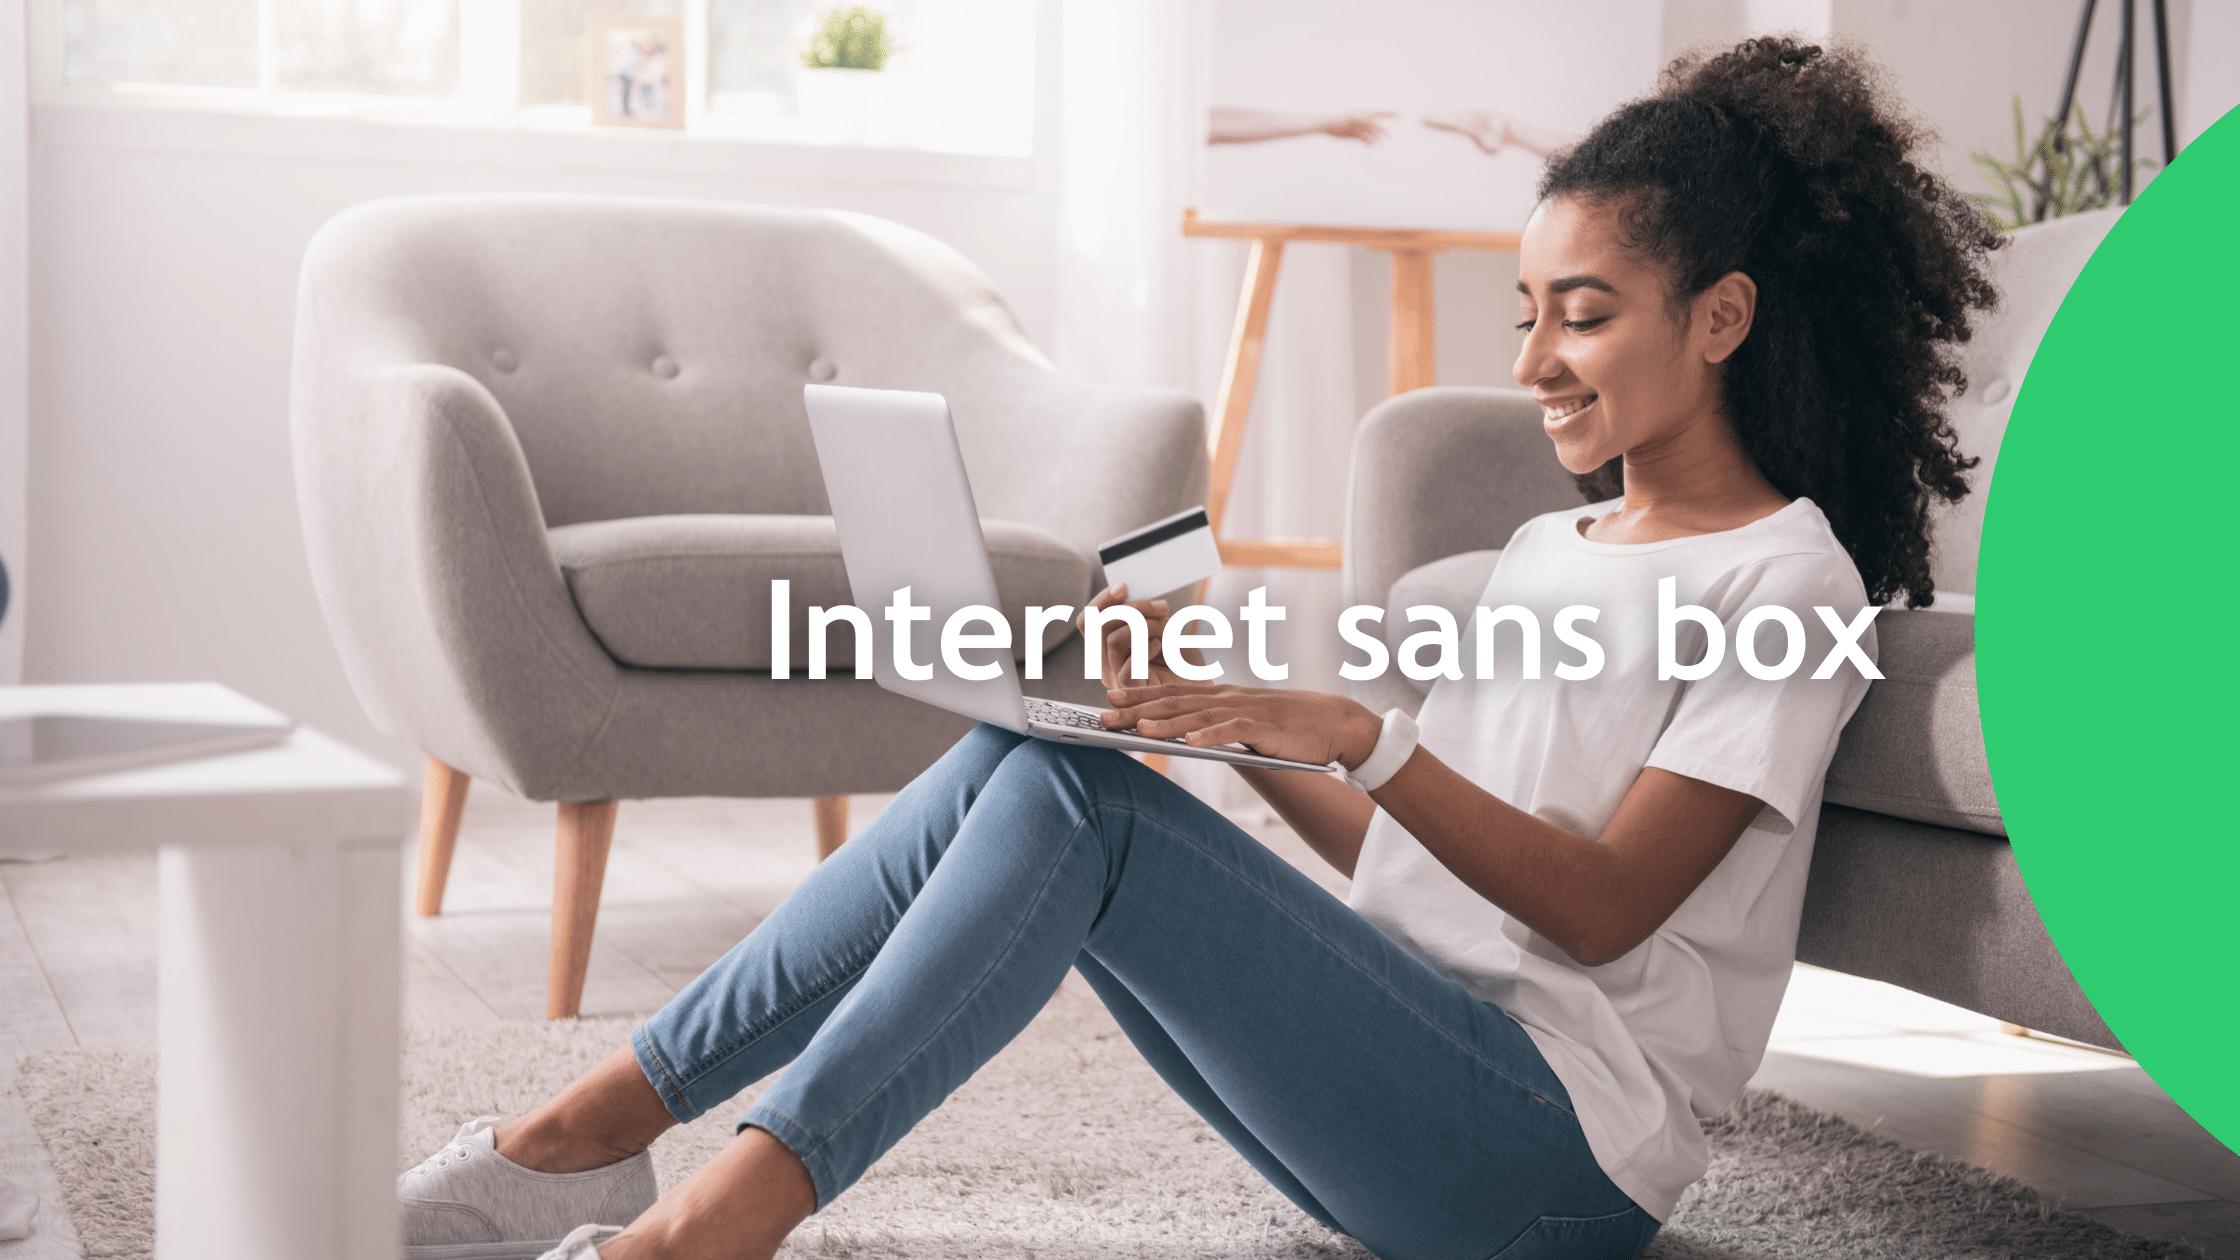 Internet sans box